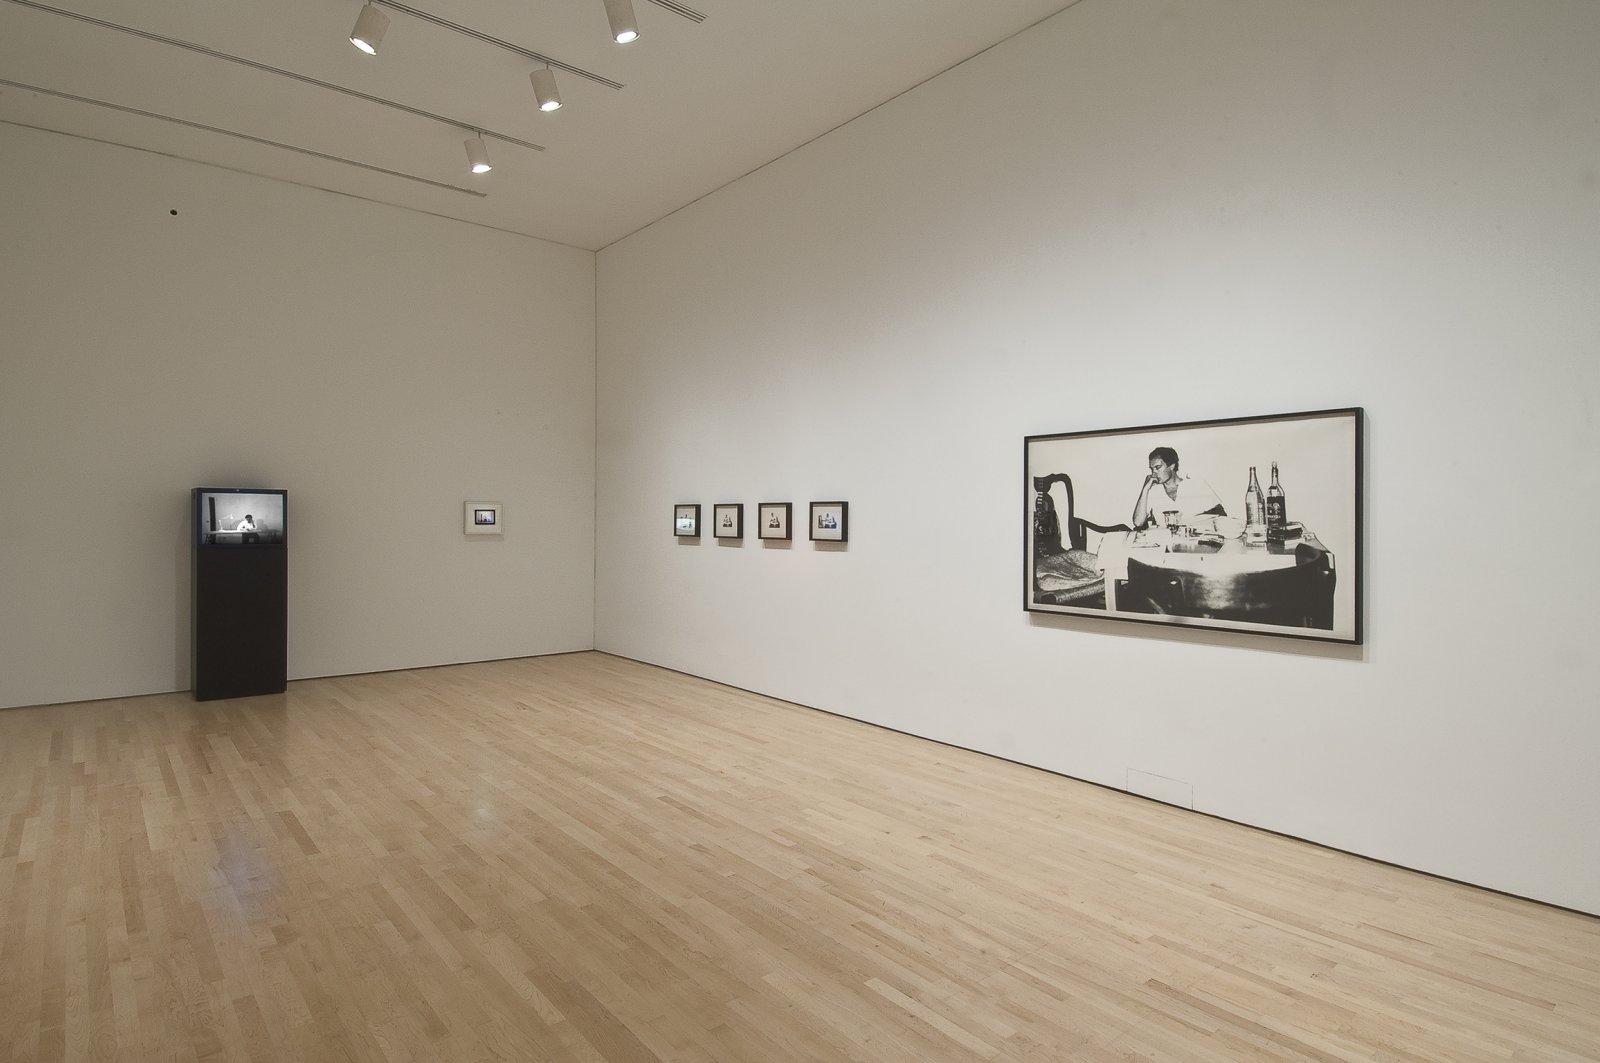 Ian Wallace, installation view, Studio Models, National Gallery of Canada, Ottawa, 2008 by Ian Wallace